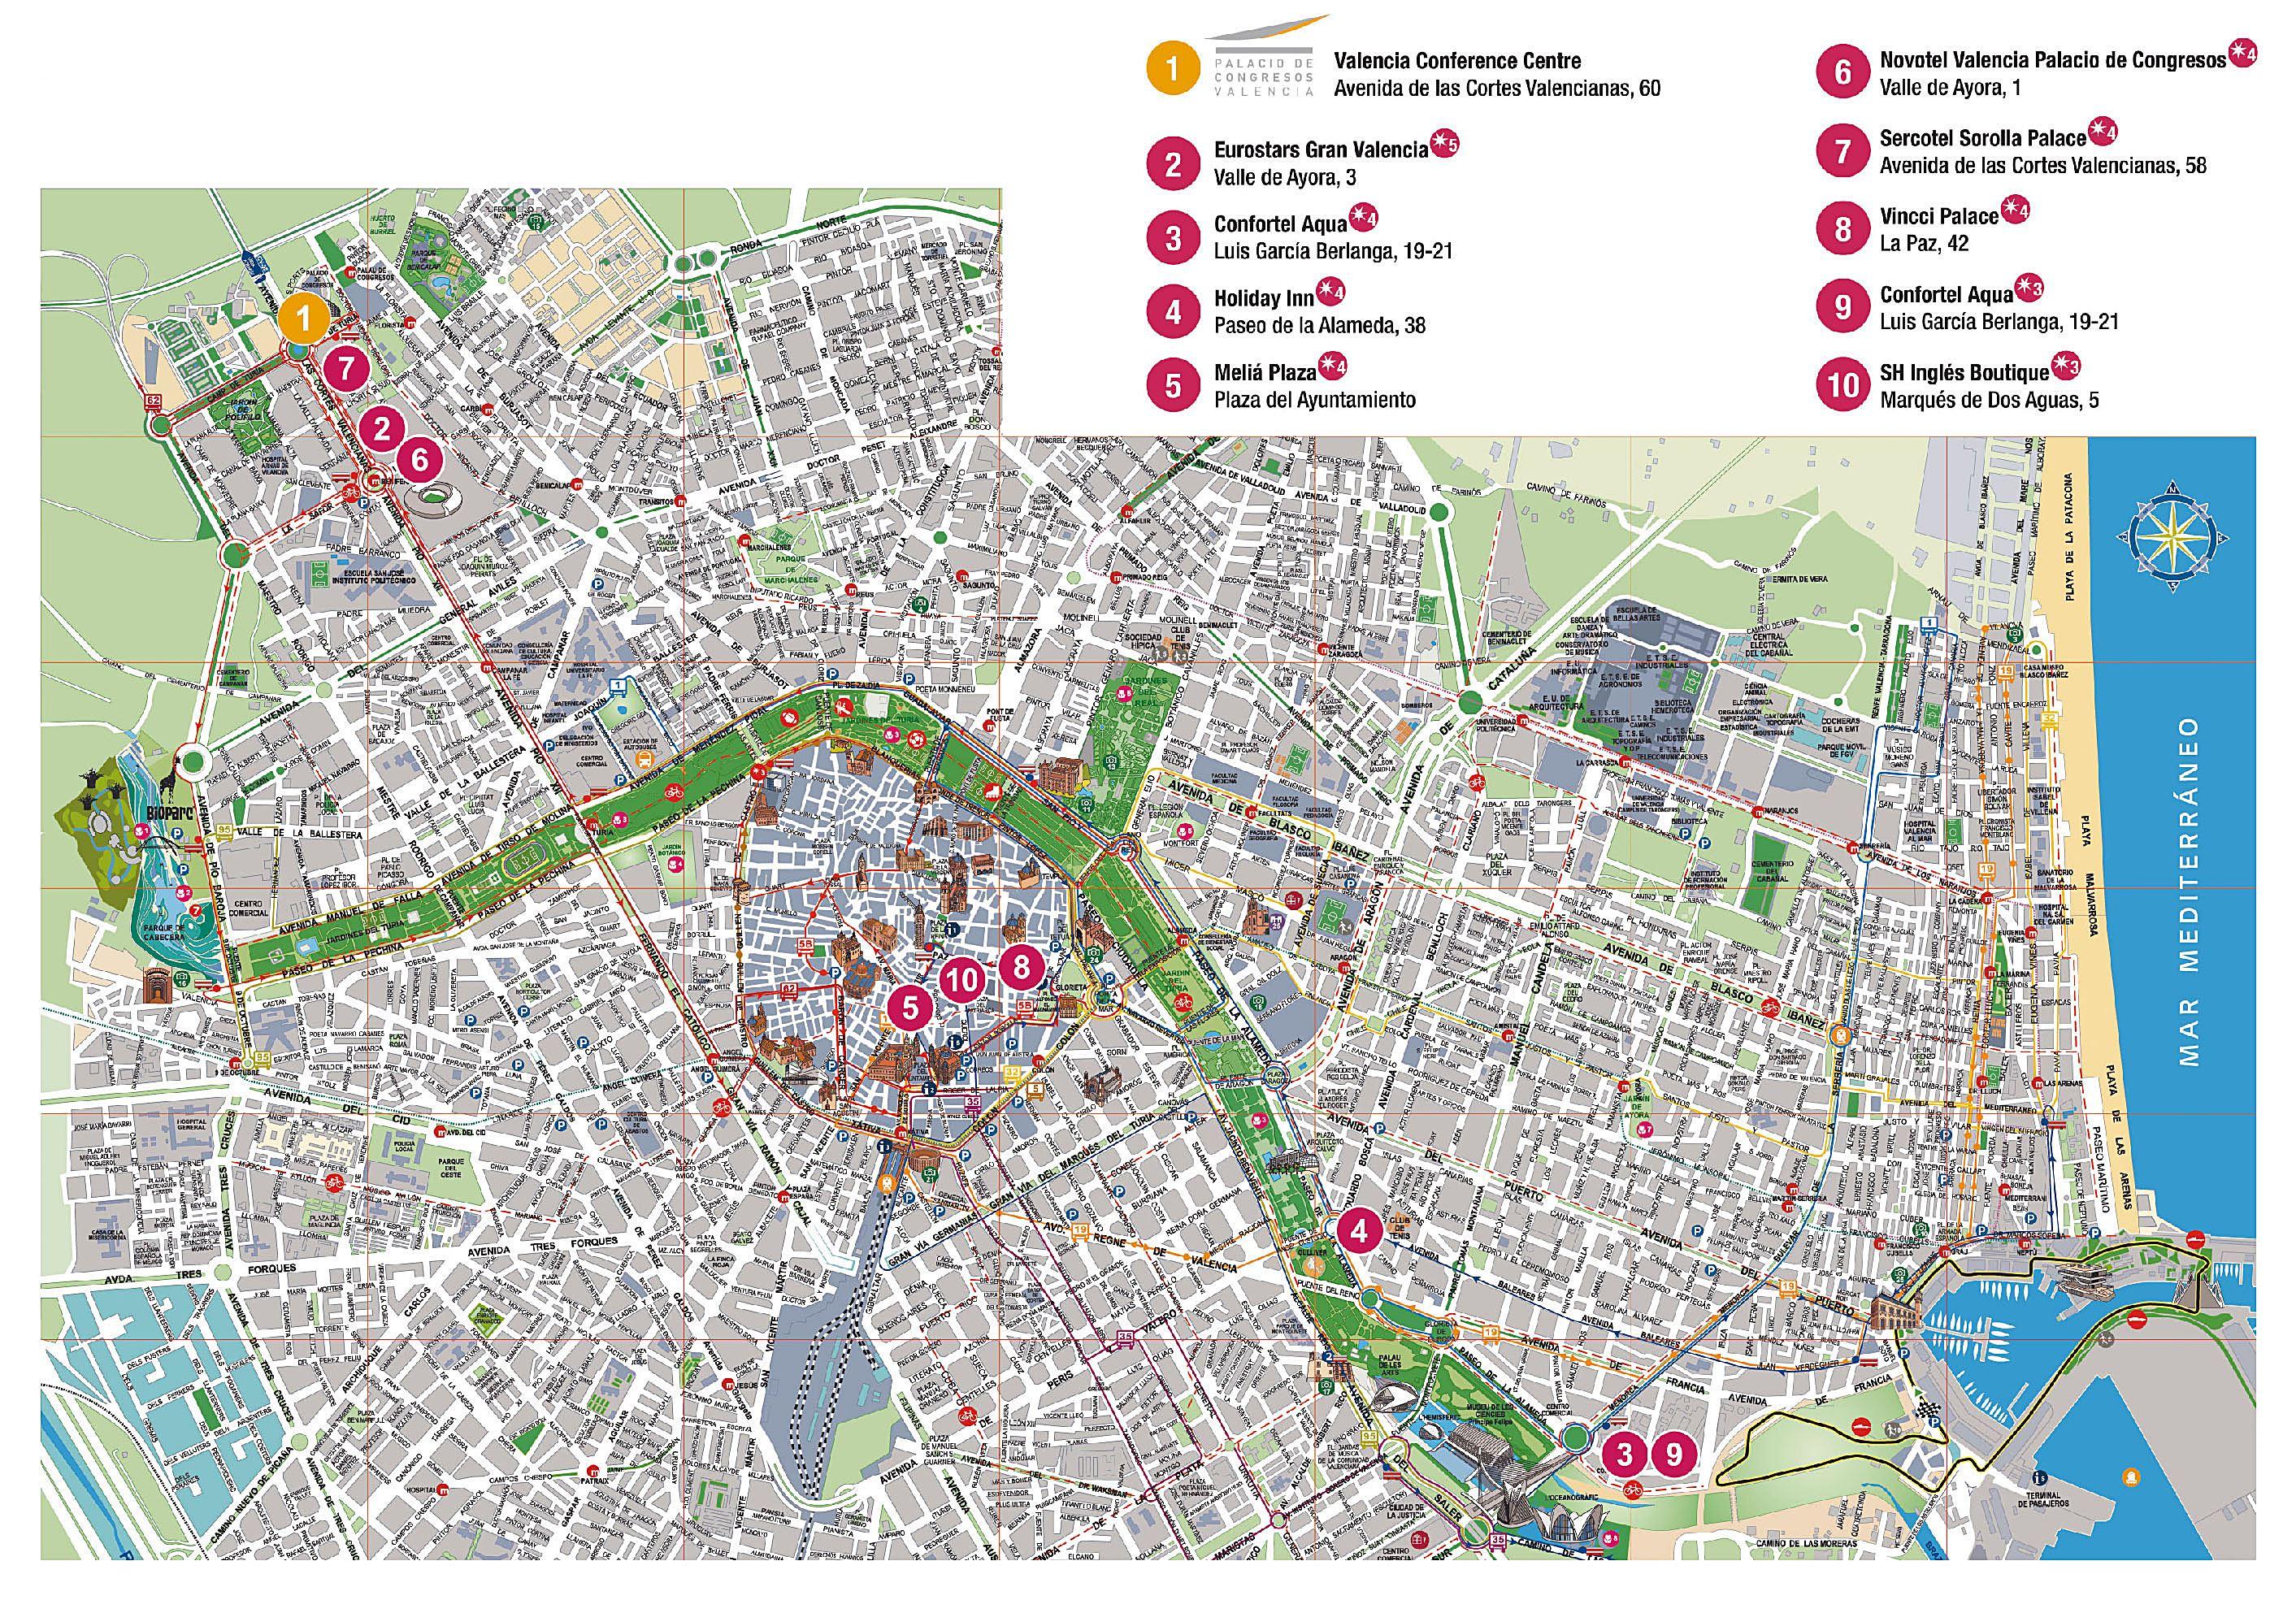 valencia karte Large Valencia Maps for Free Download and Print   High Resolution  valencia karte